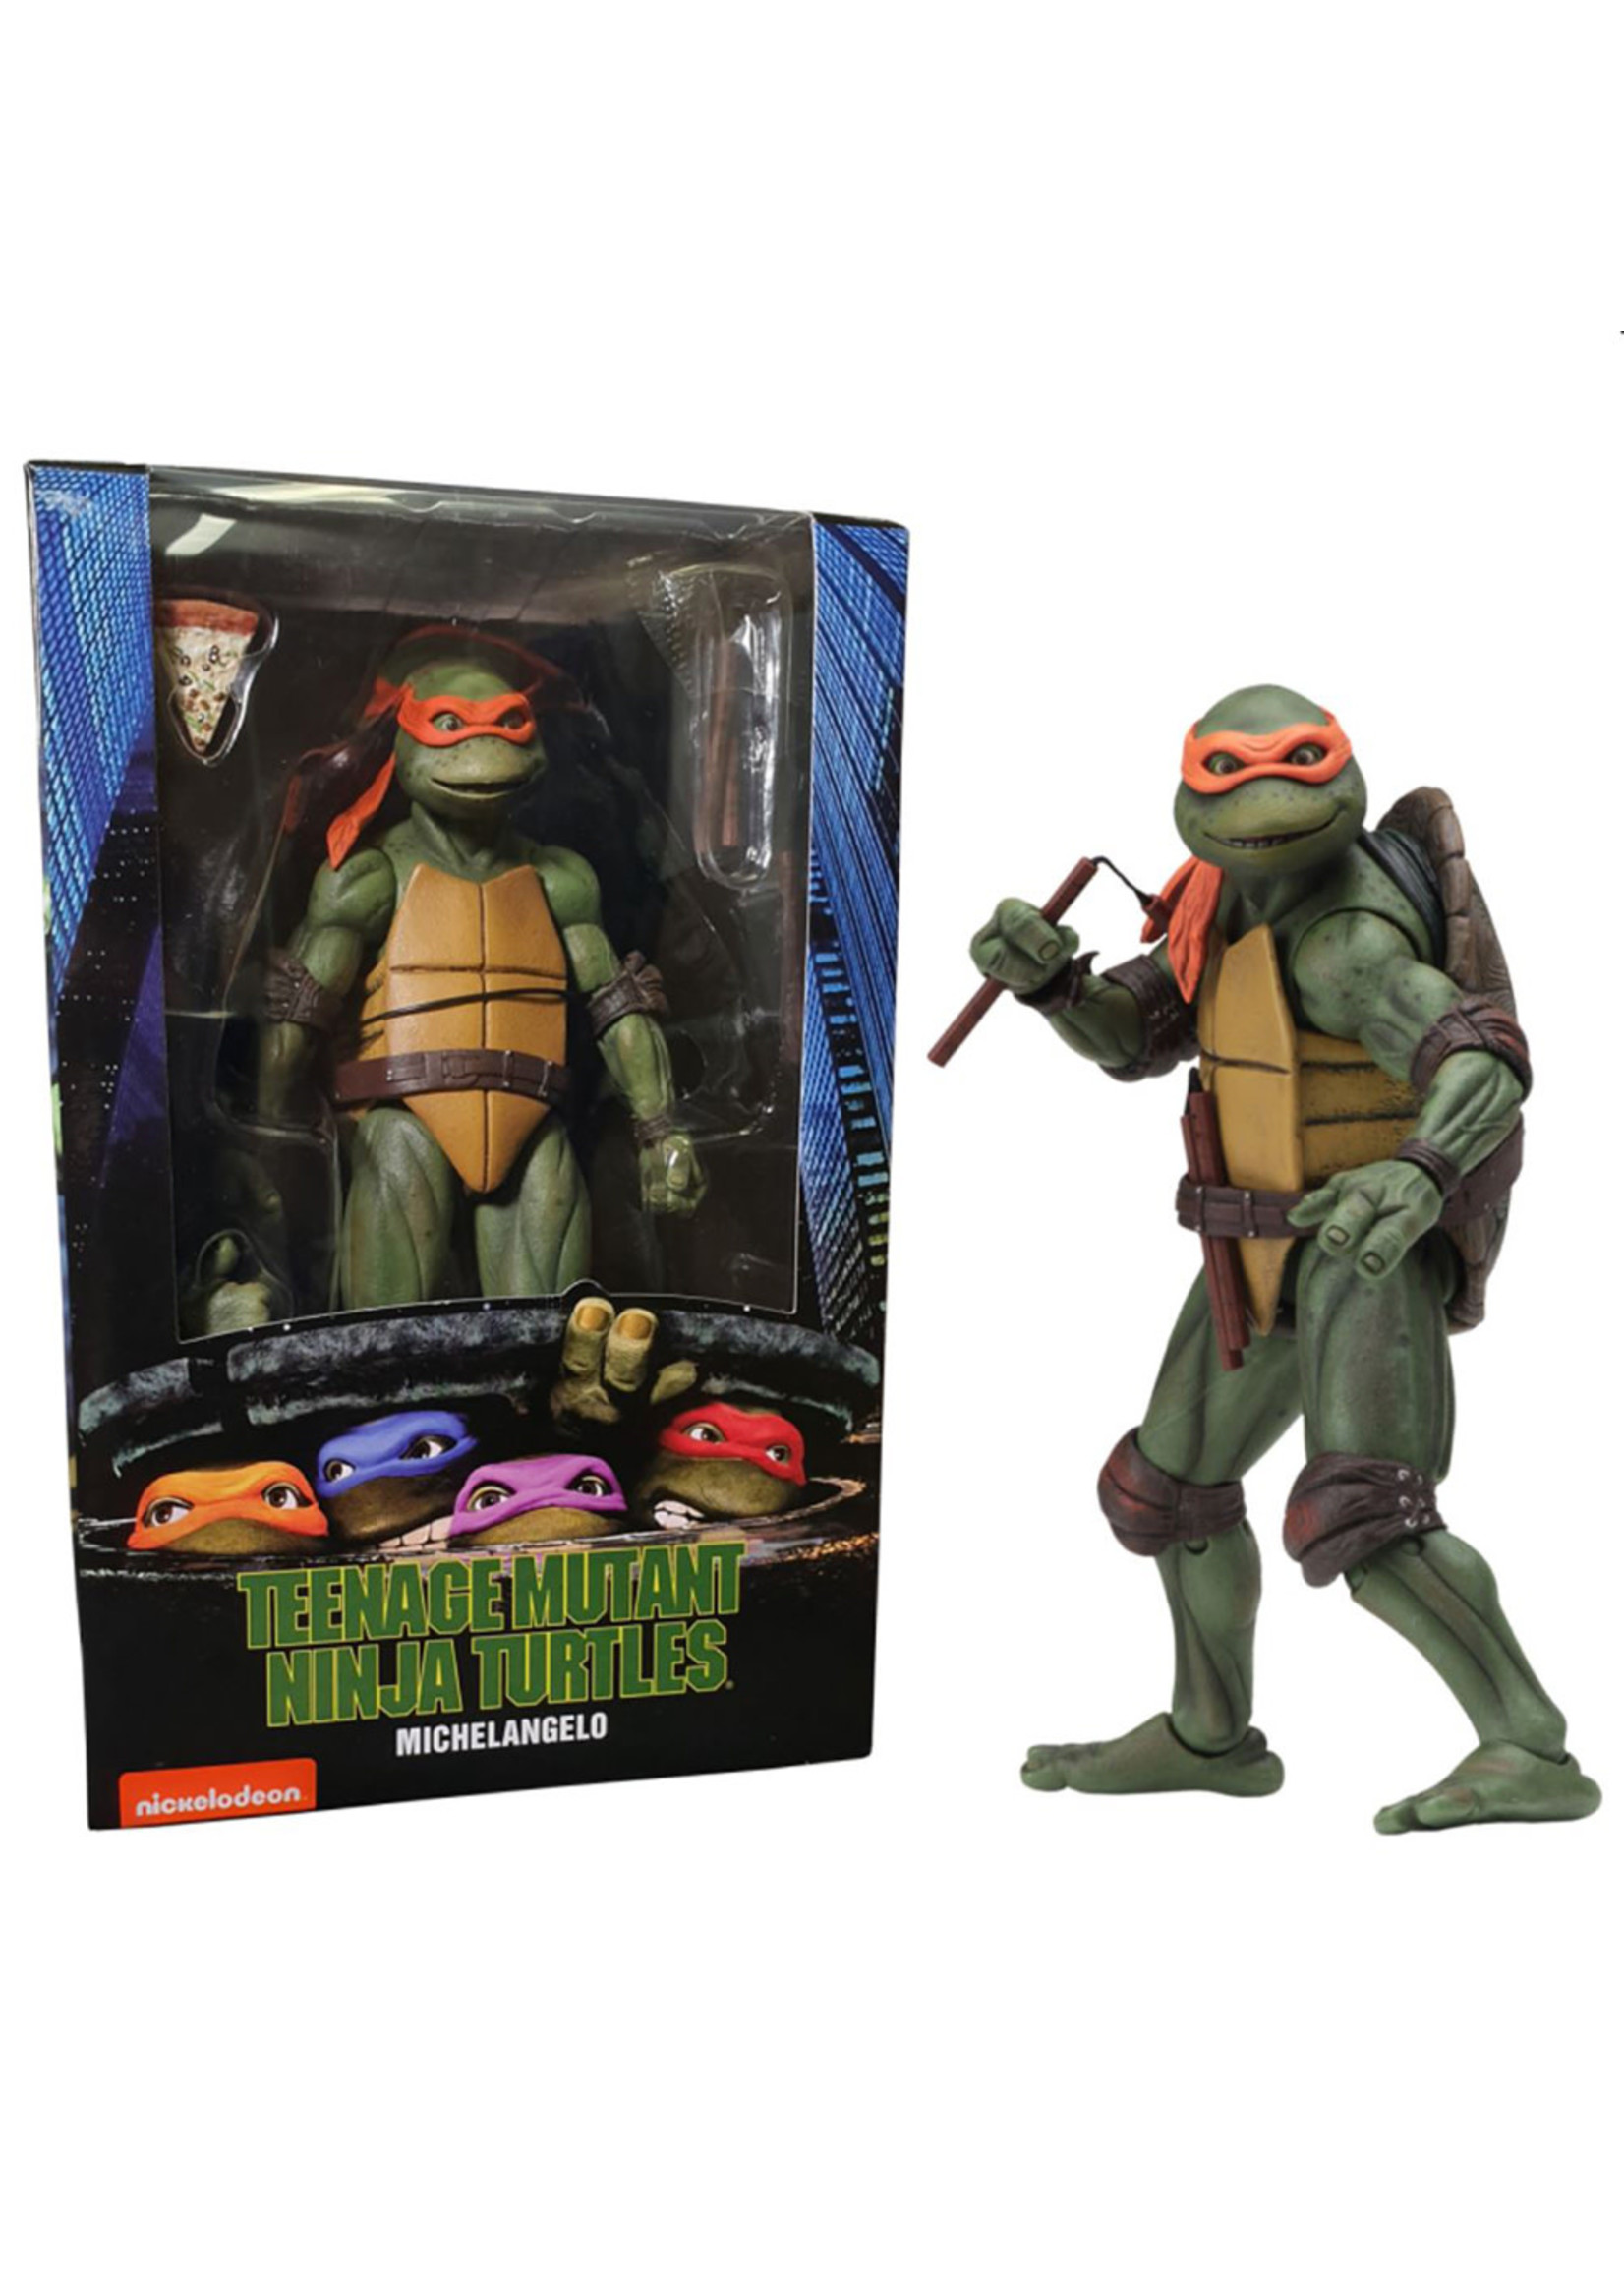 Neca TMNT - Michelangelo